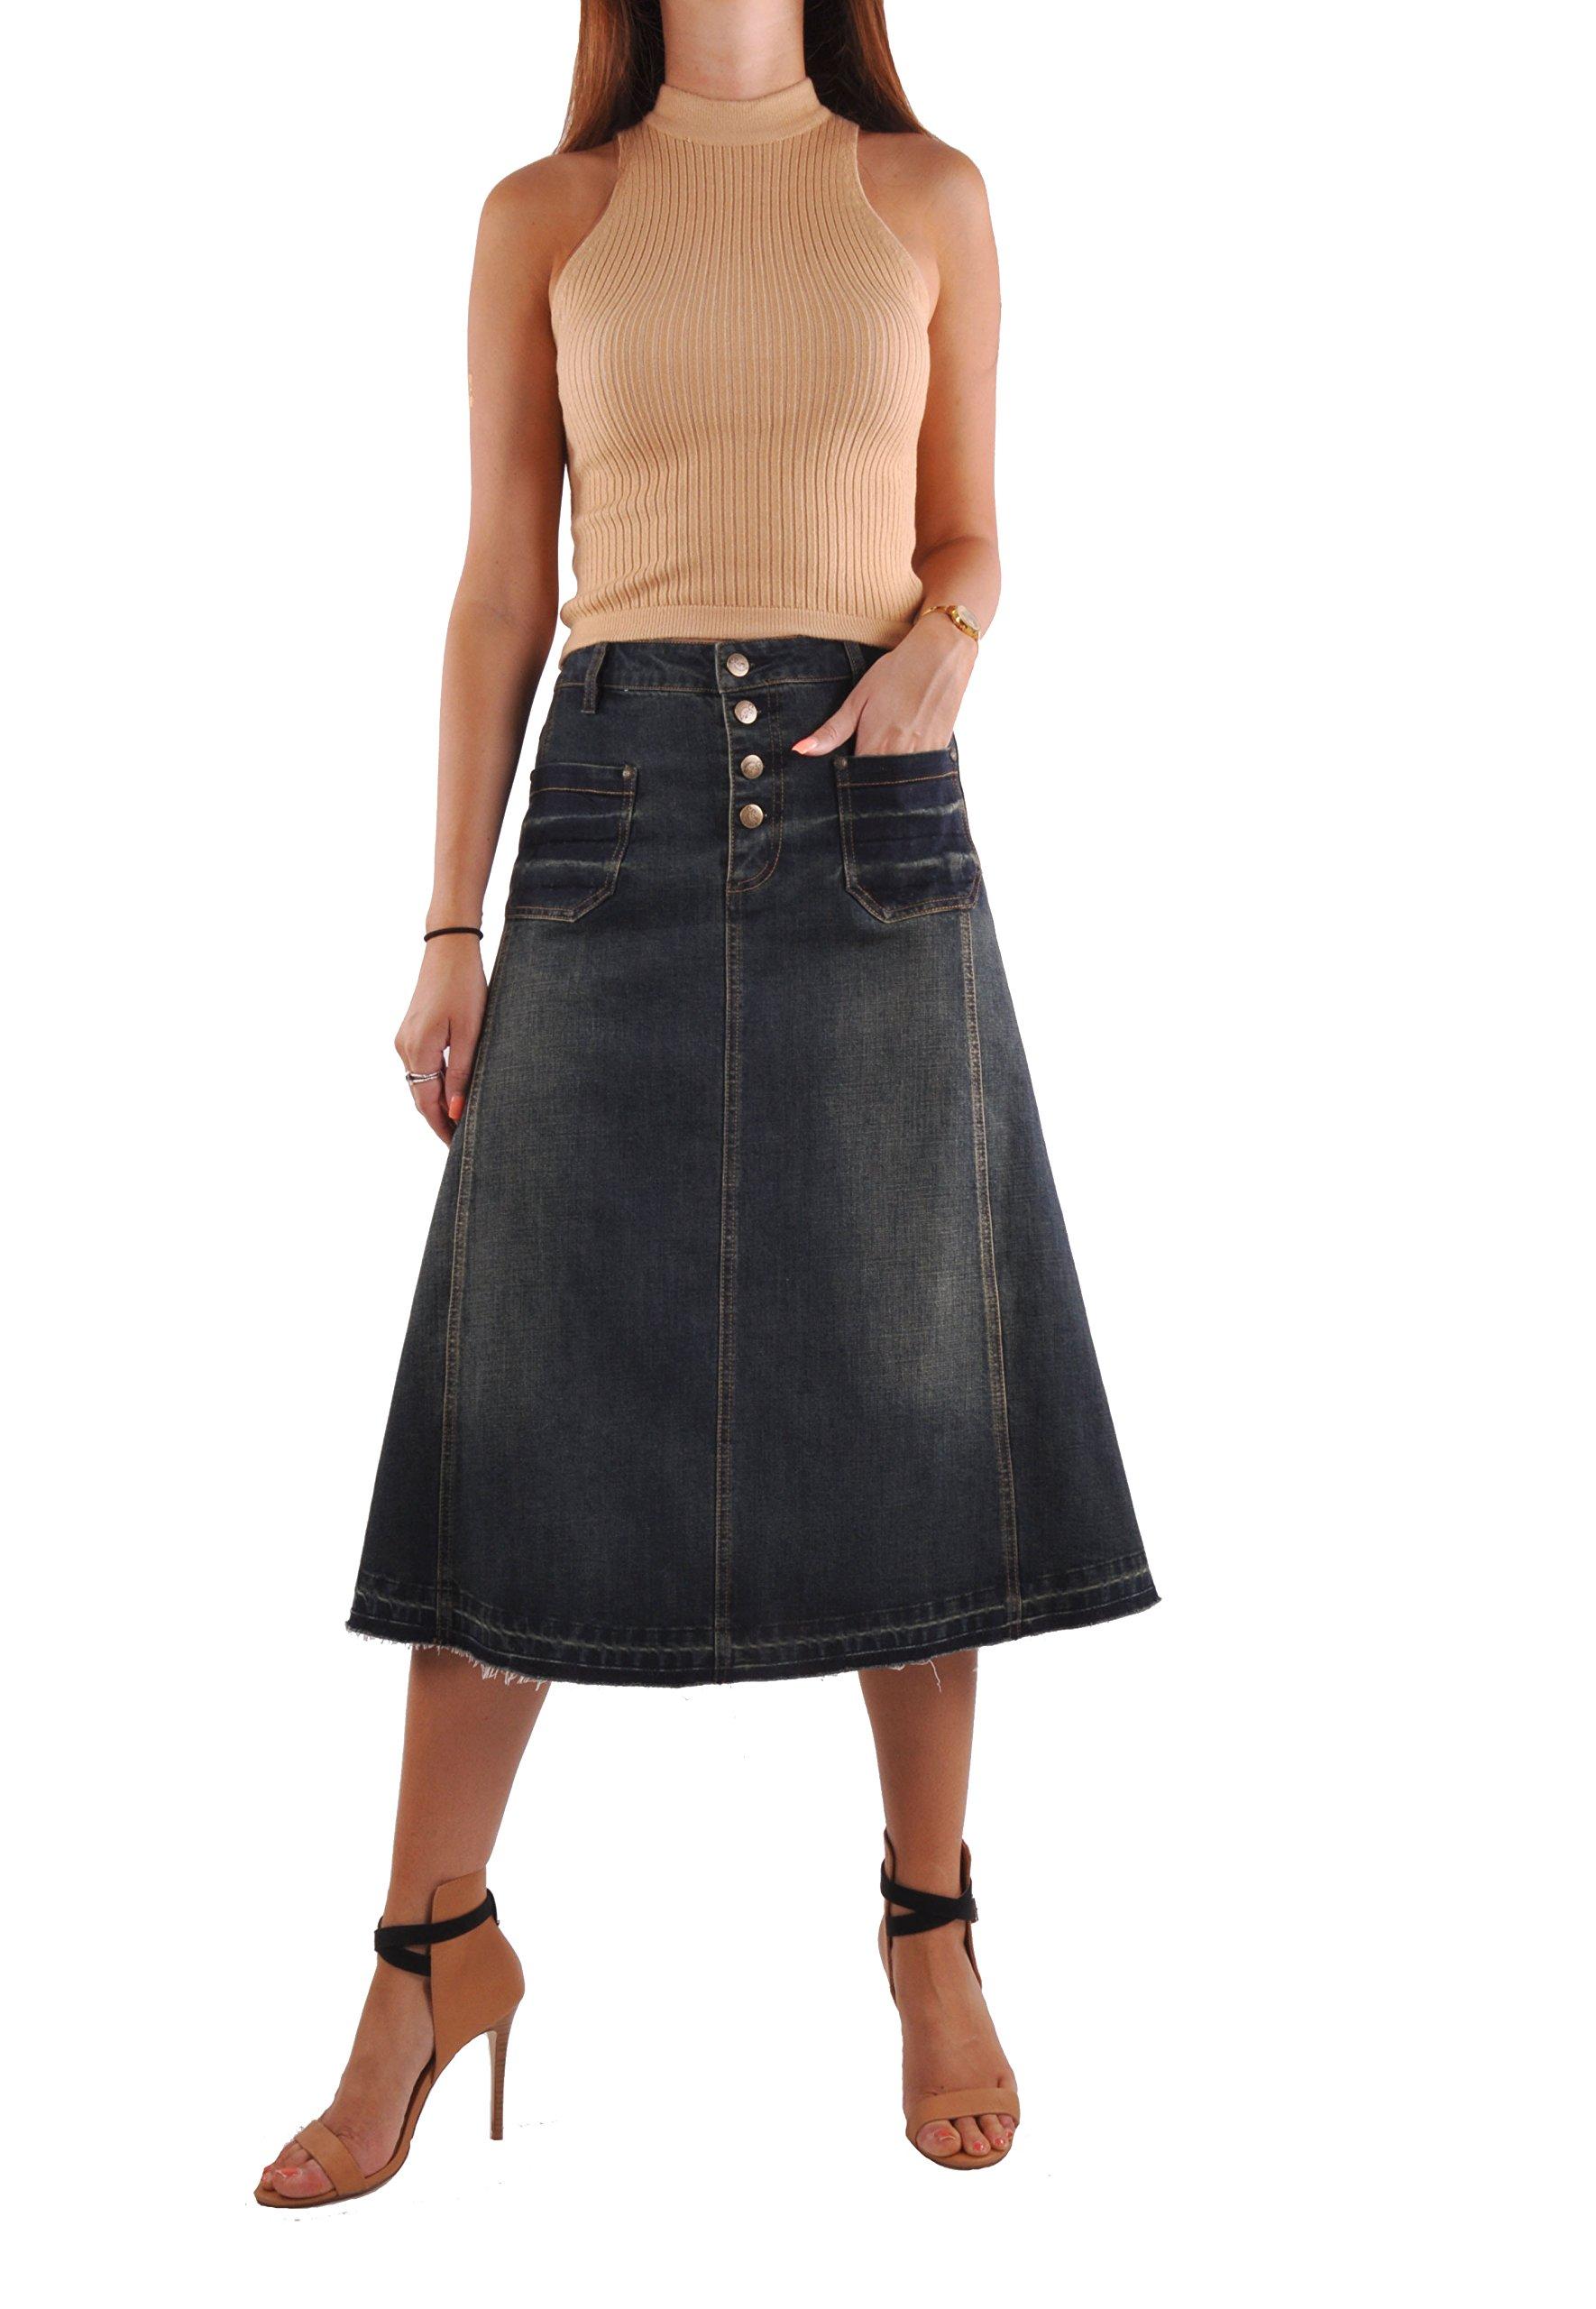 Style J Everyday Vintage Jean Skirt-Blue-28(8)